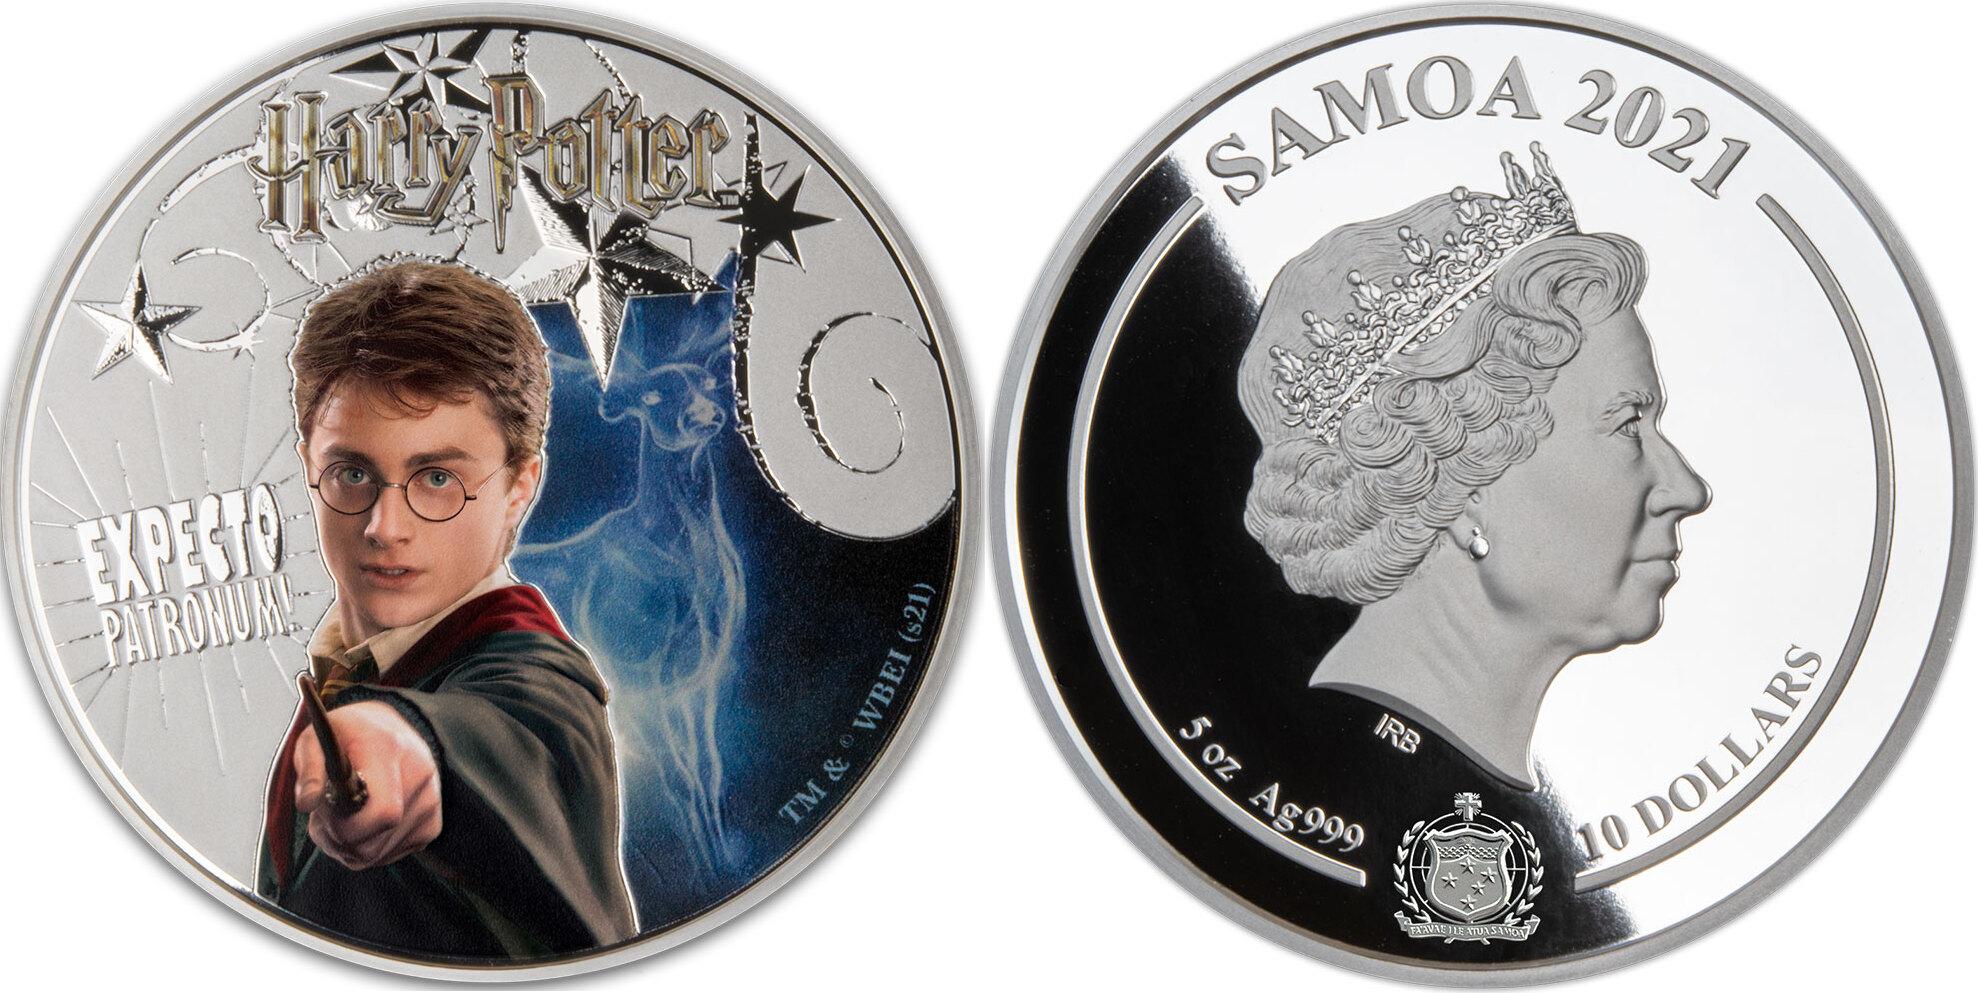 samoa-2021-harry-potter-charme-patronum